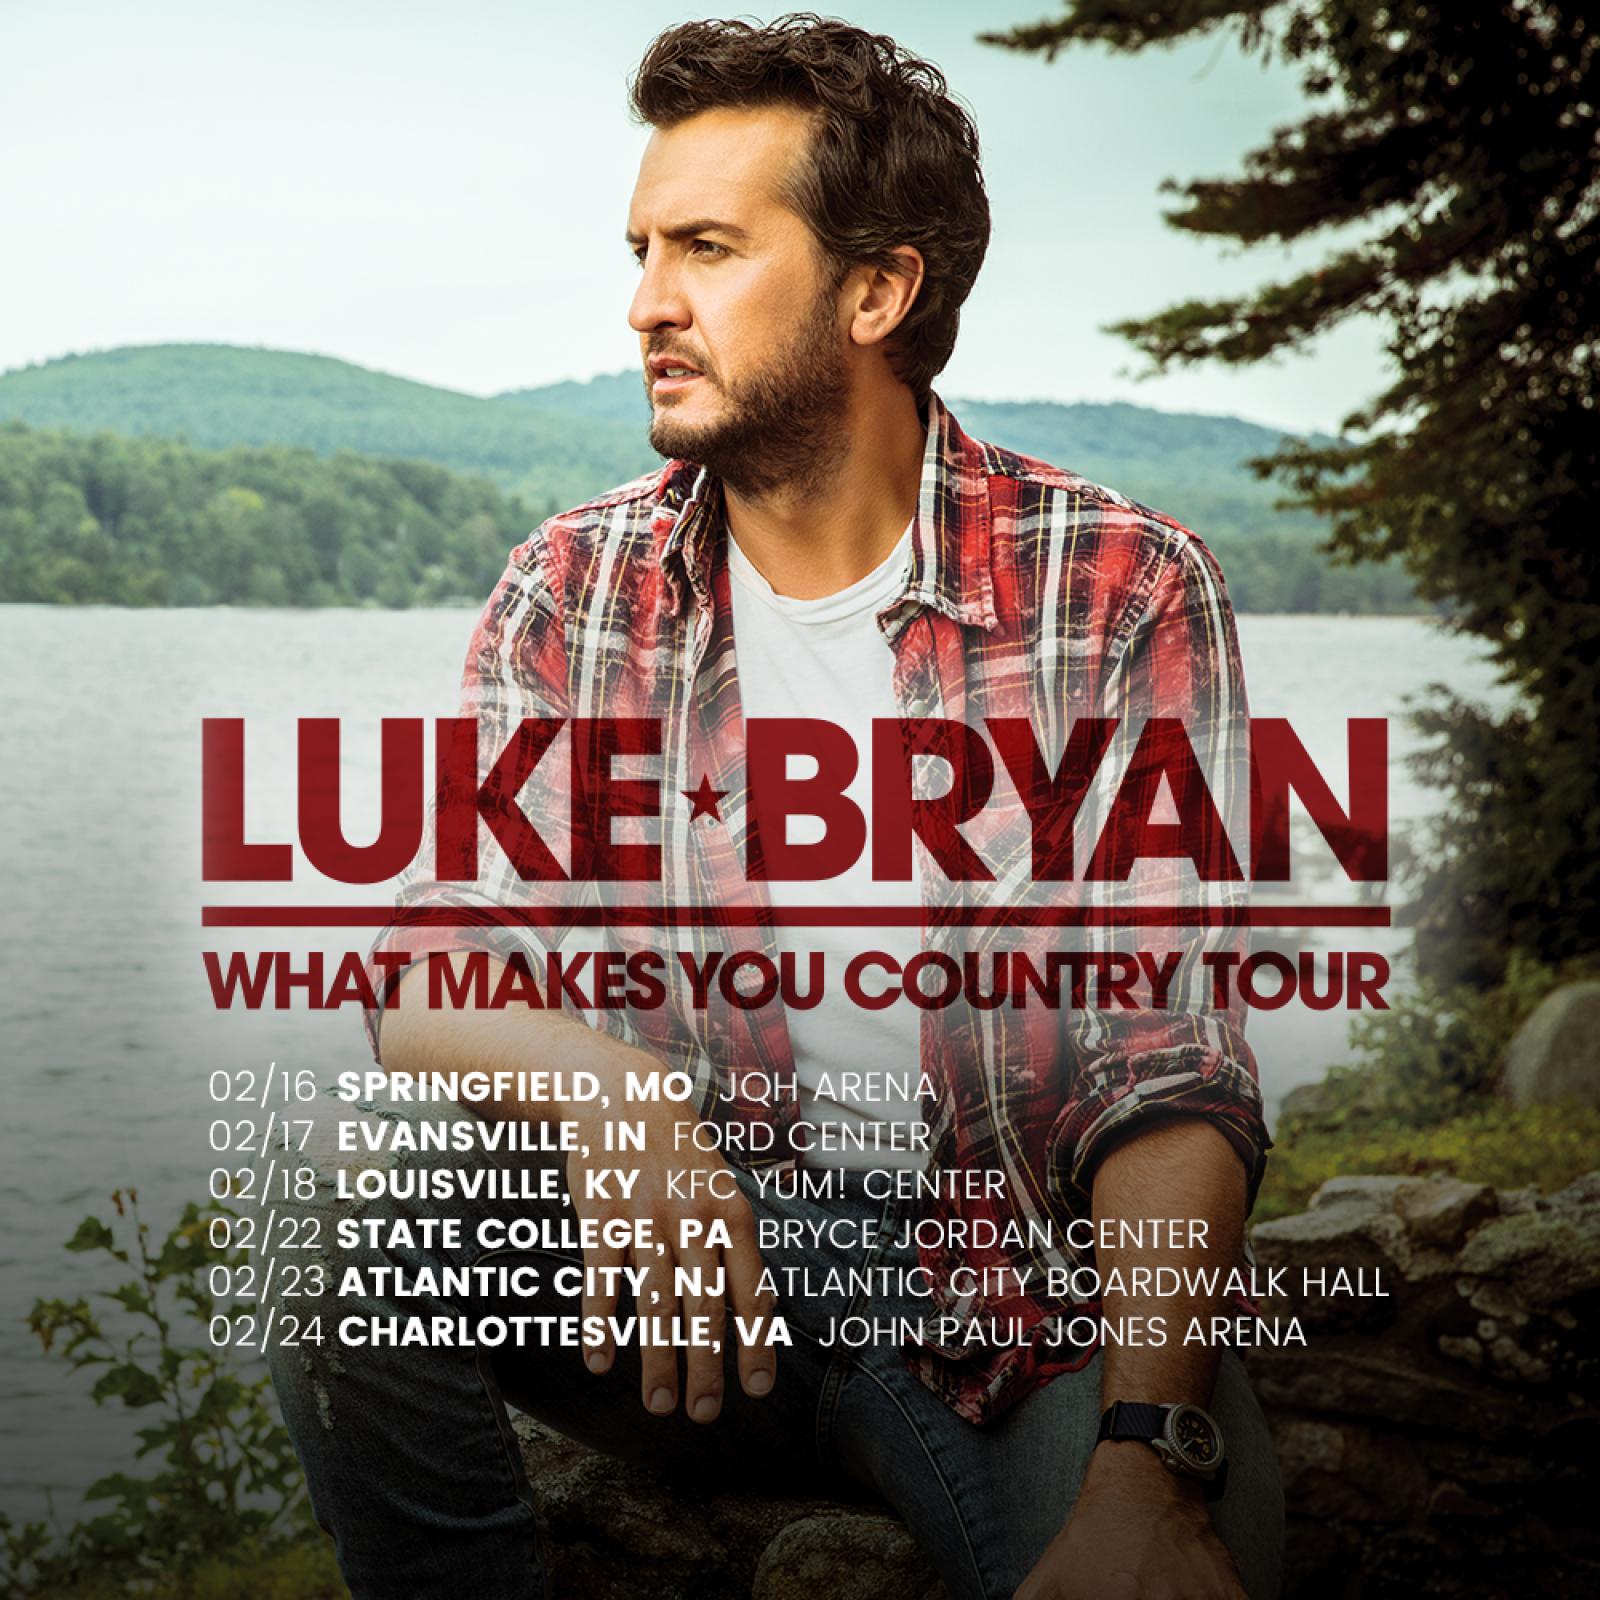 Luke Bryan New Tour Dates